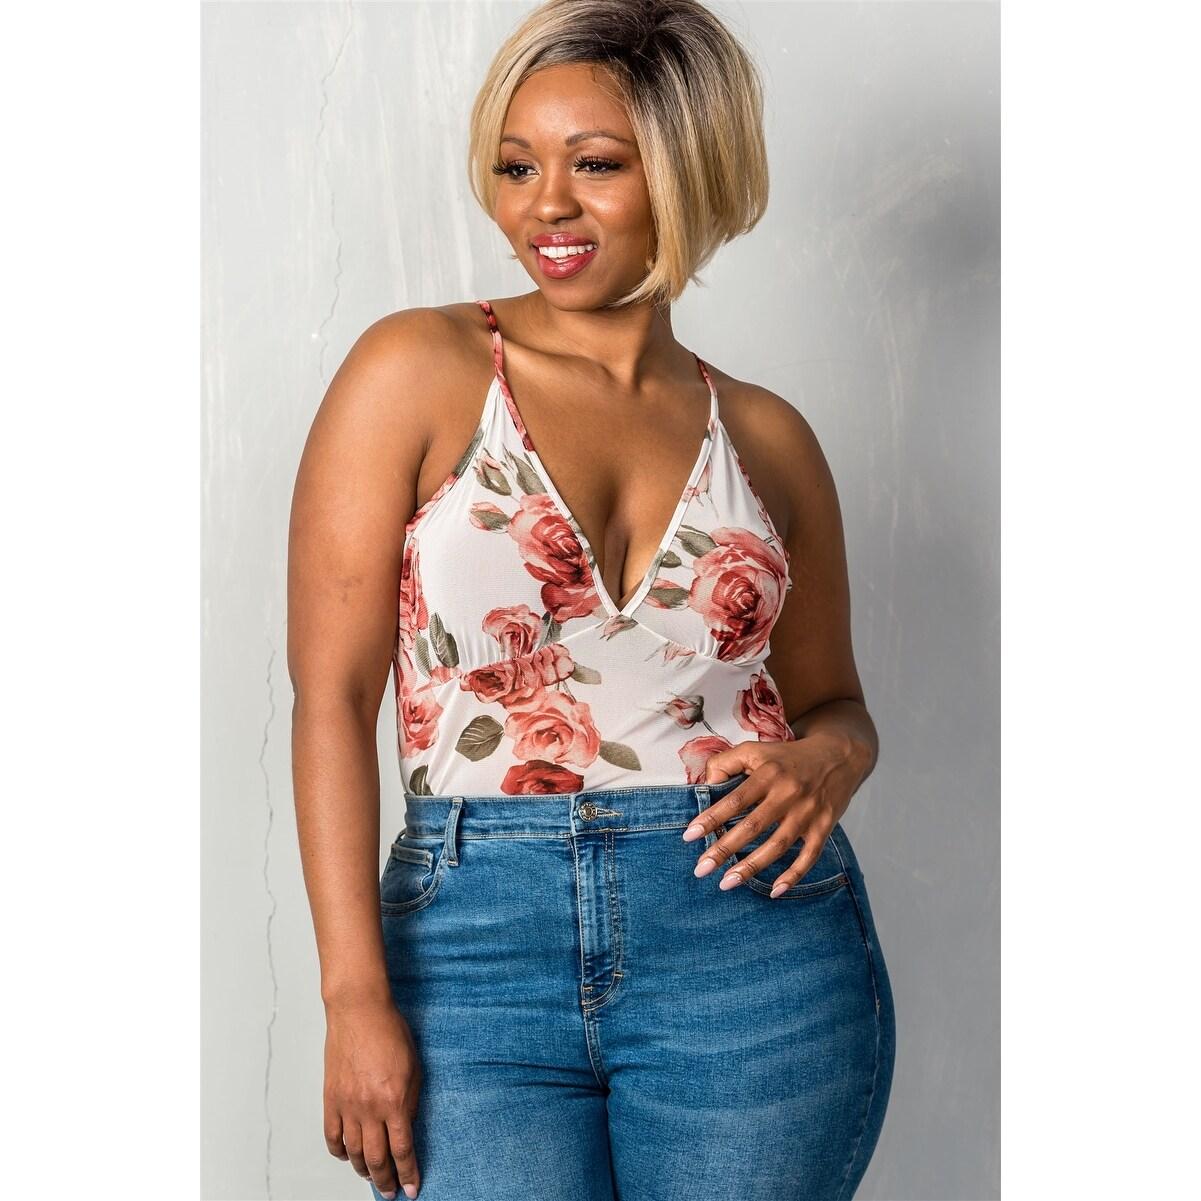 cc184e65f043 Ladies Fashion Plus Size V Neckline Cream   Floral Sheer Mesh Sleeveless  Plus Size Bodysuit - Size - 3Xl